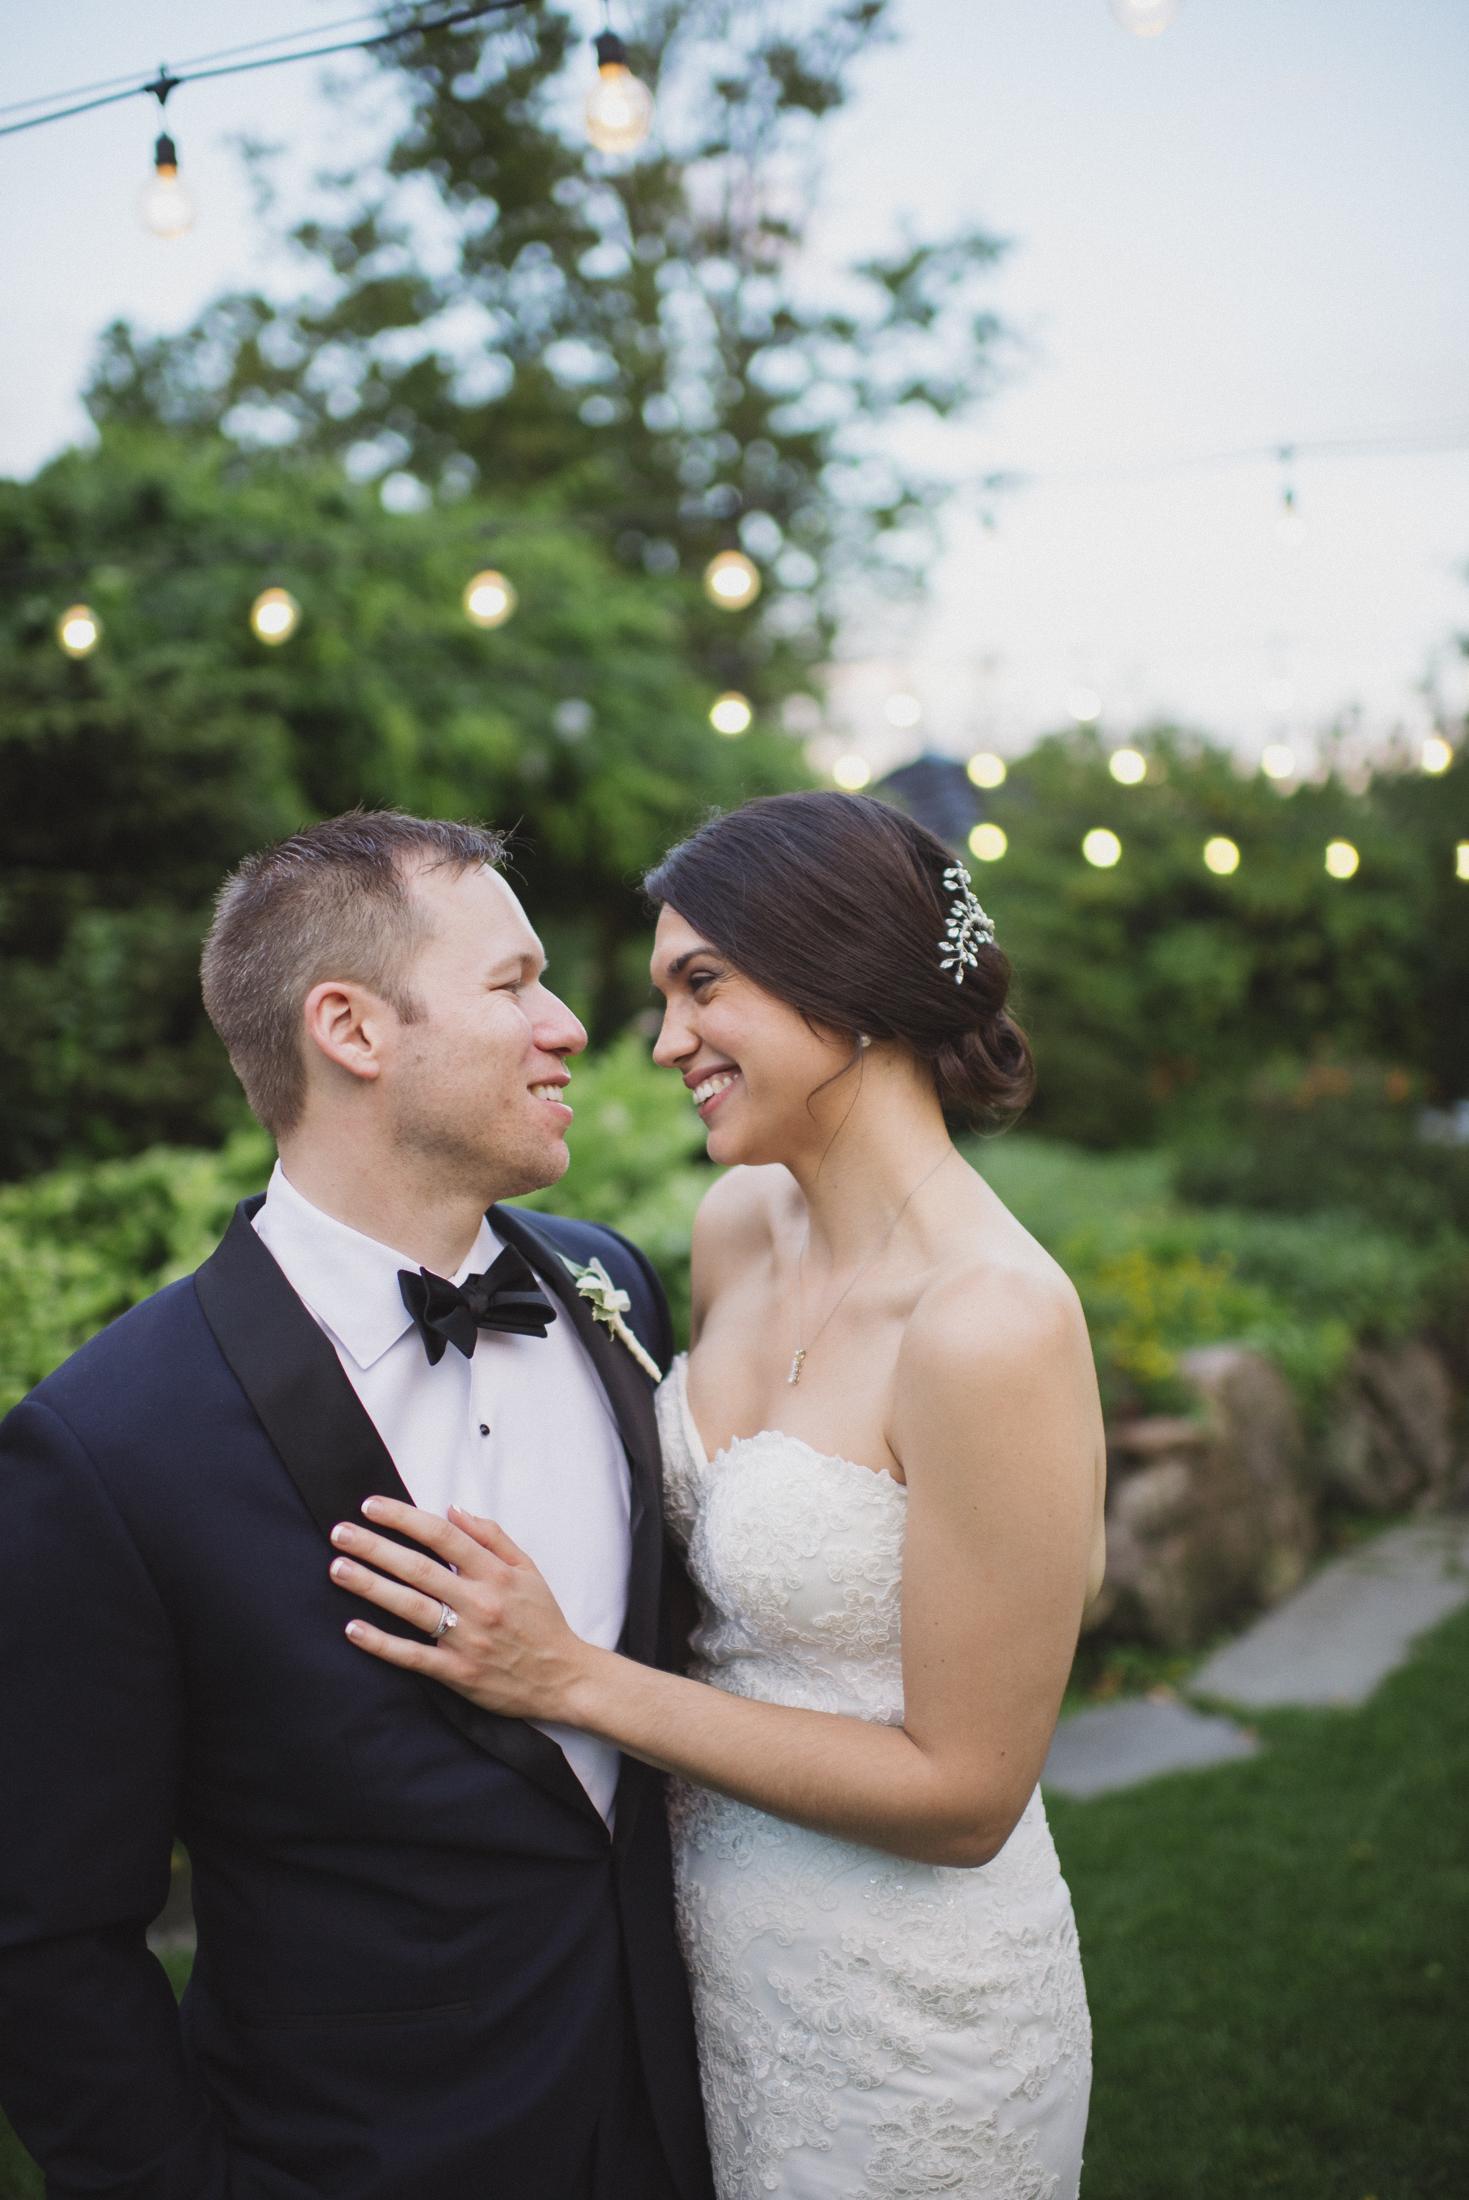 NH Wedding Photographer: BVI couple under lights